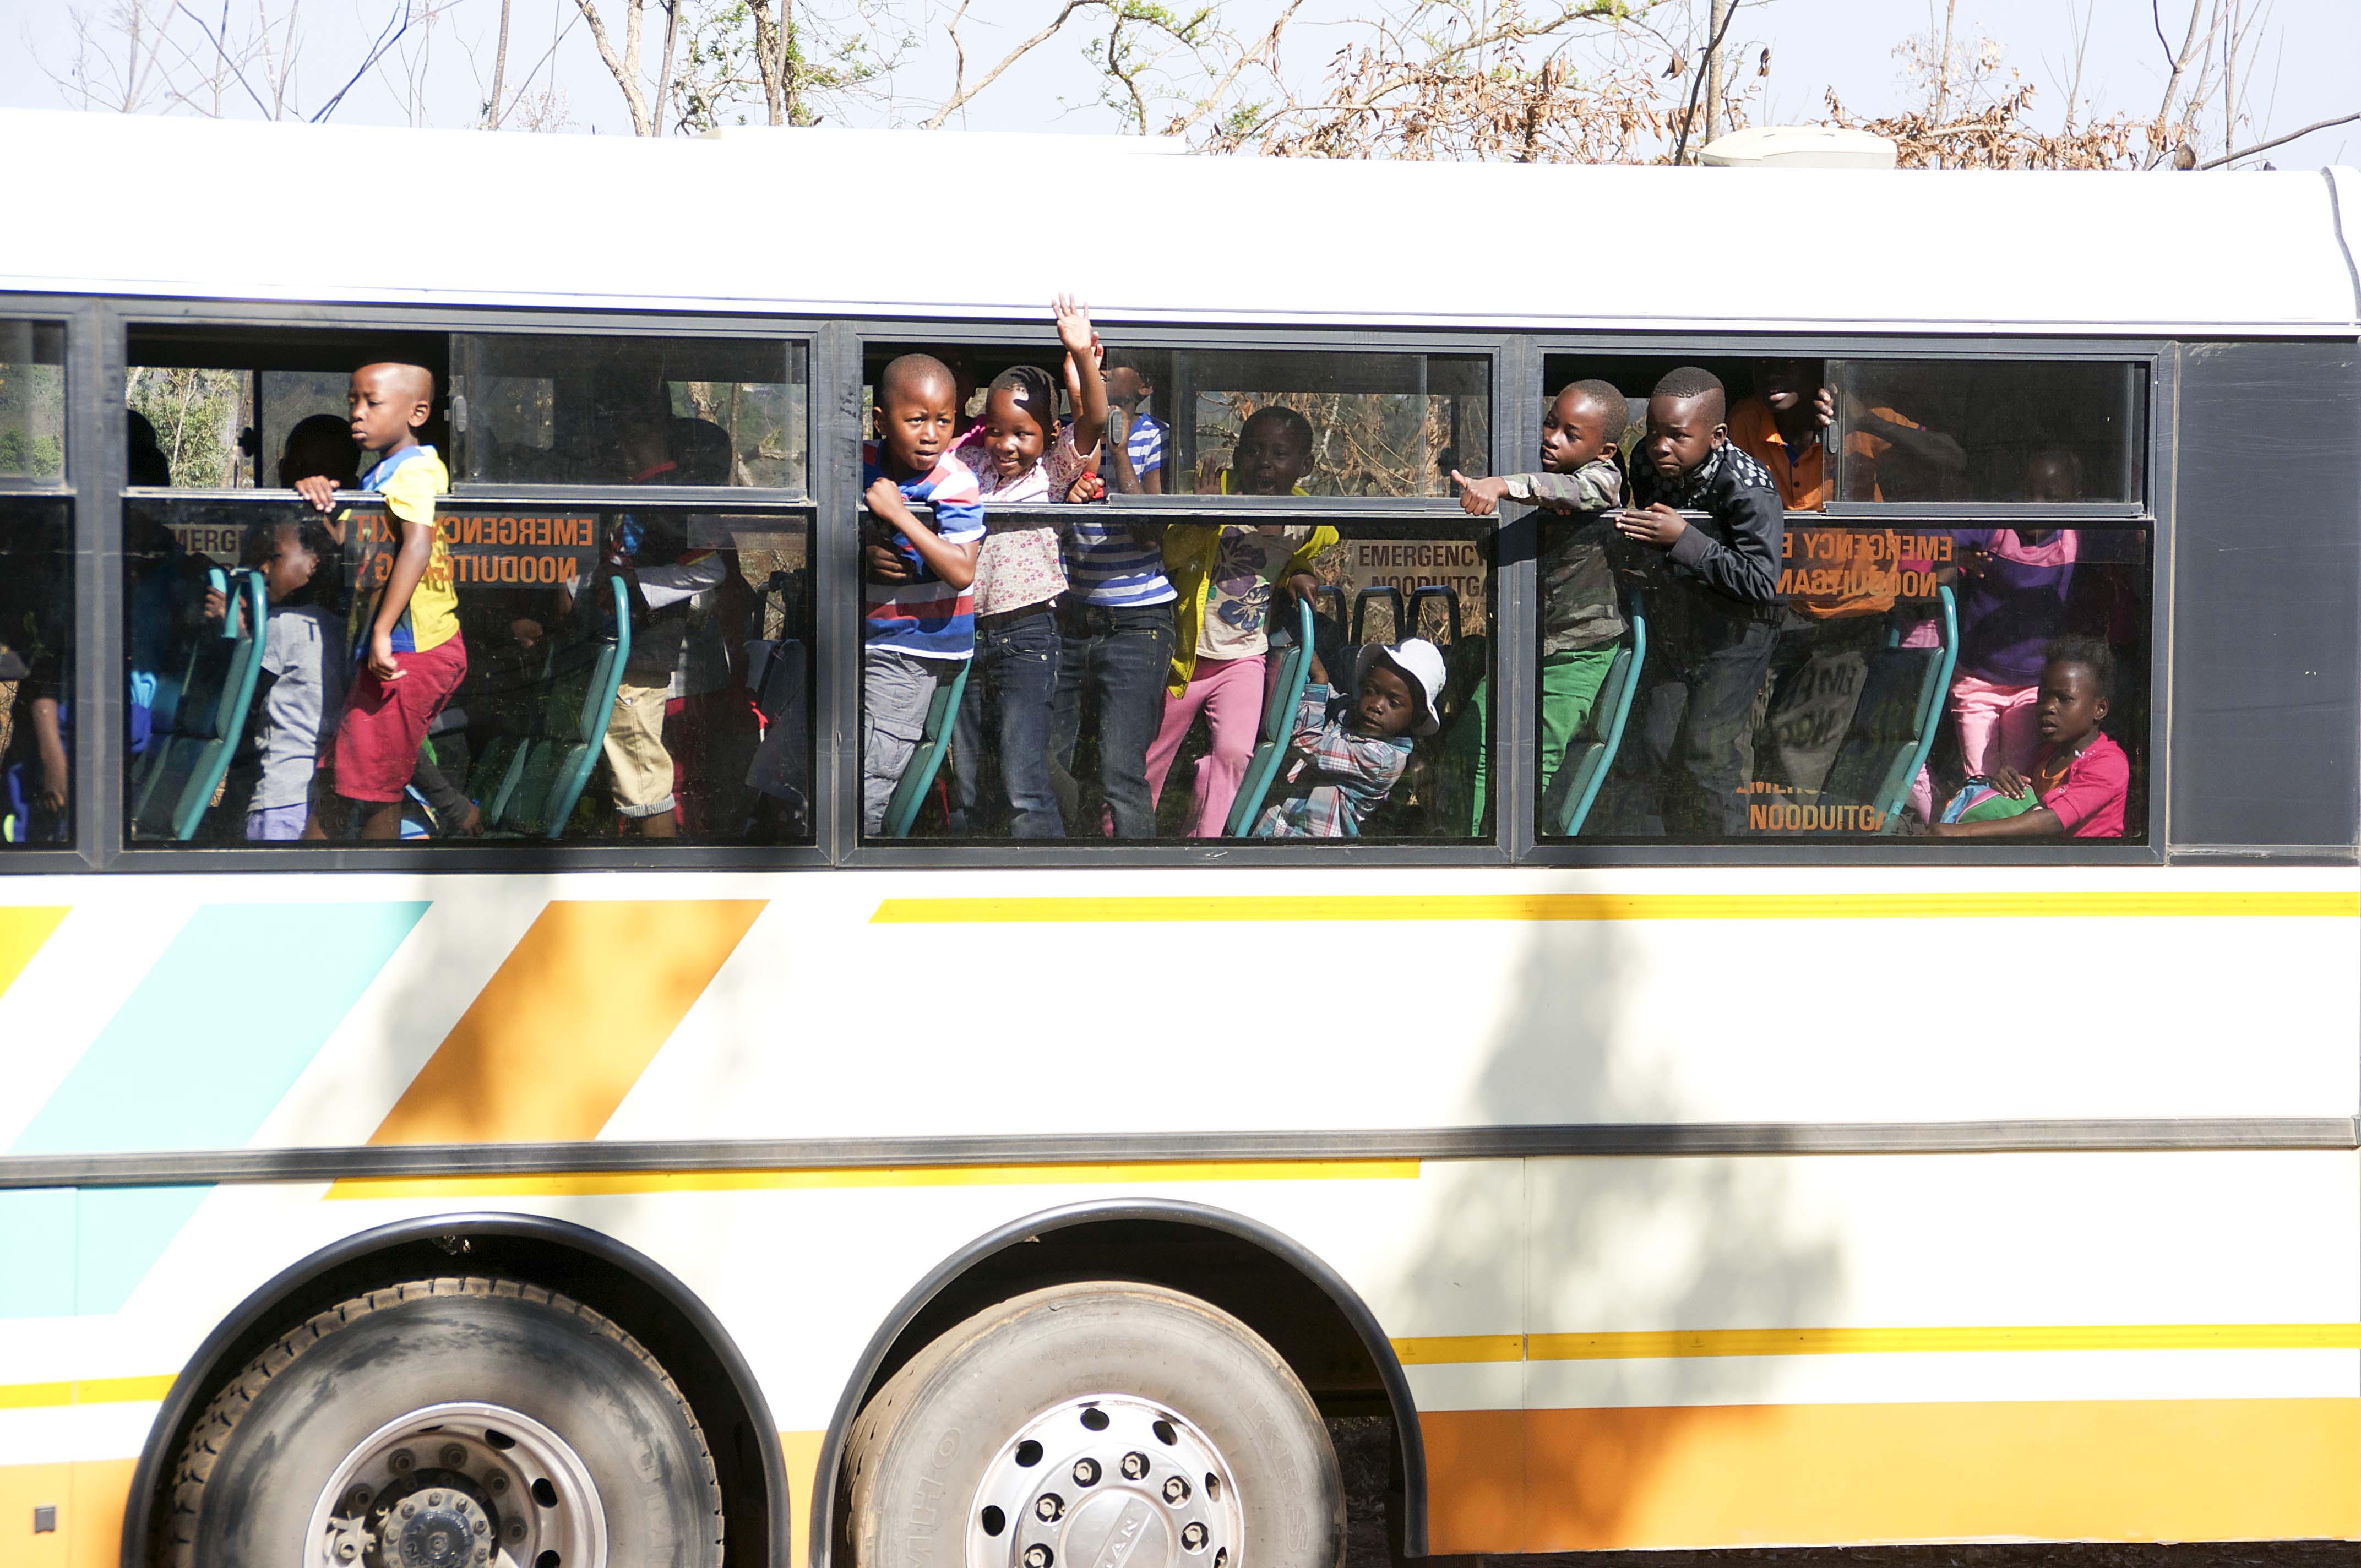 the bus arrives